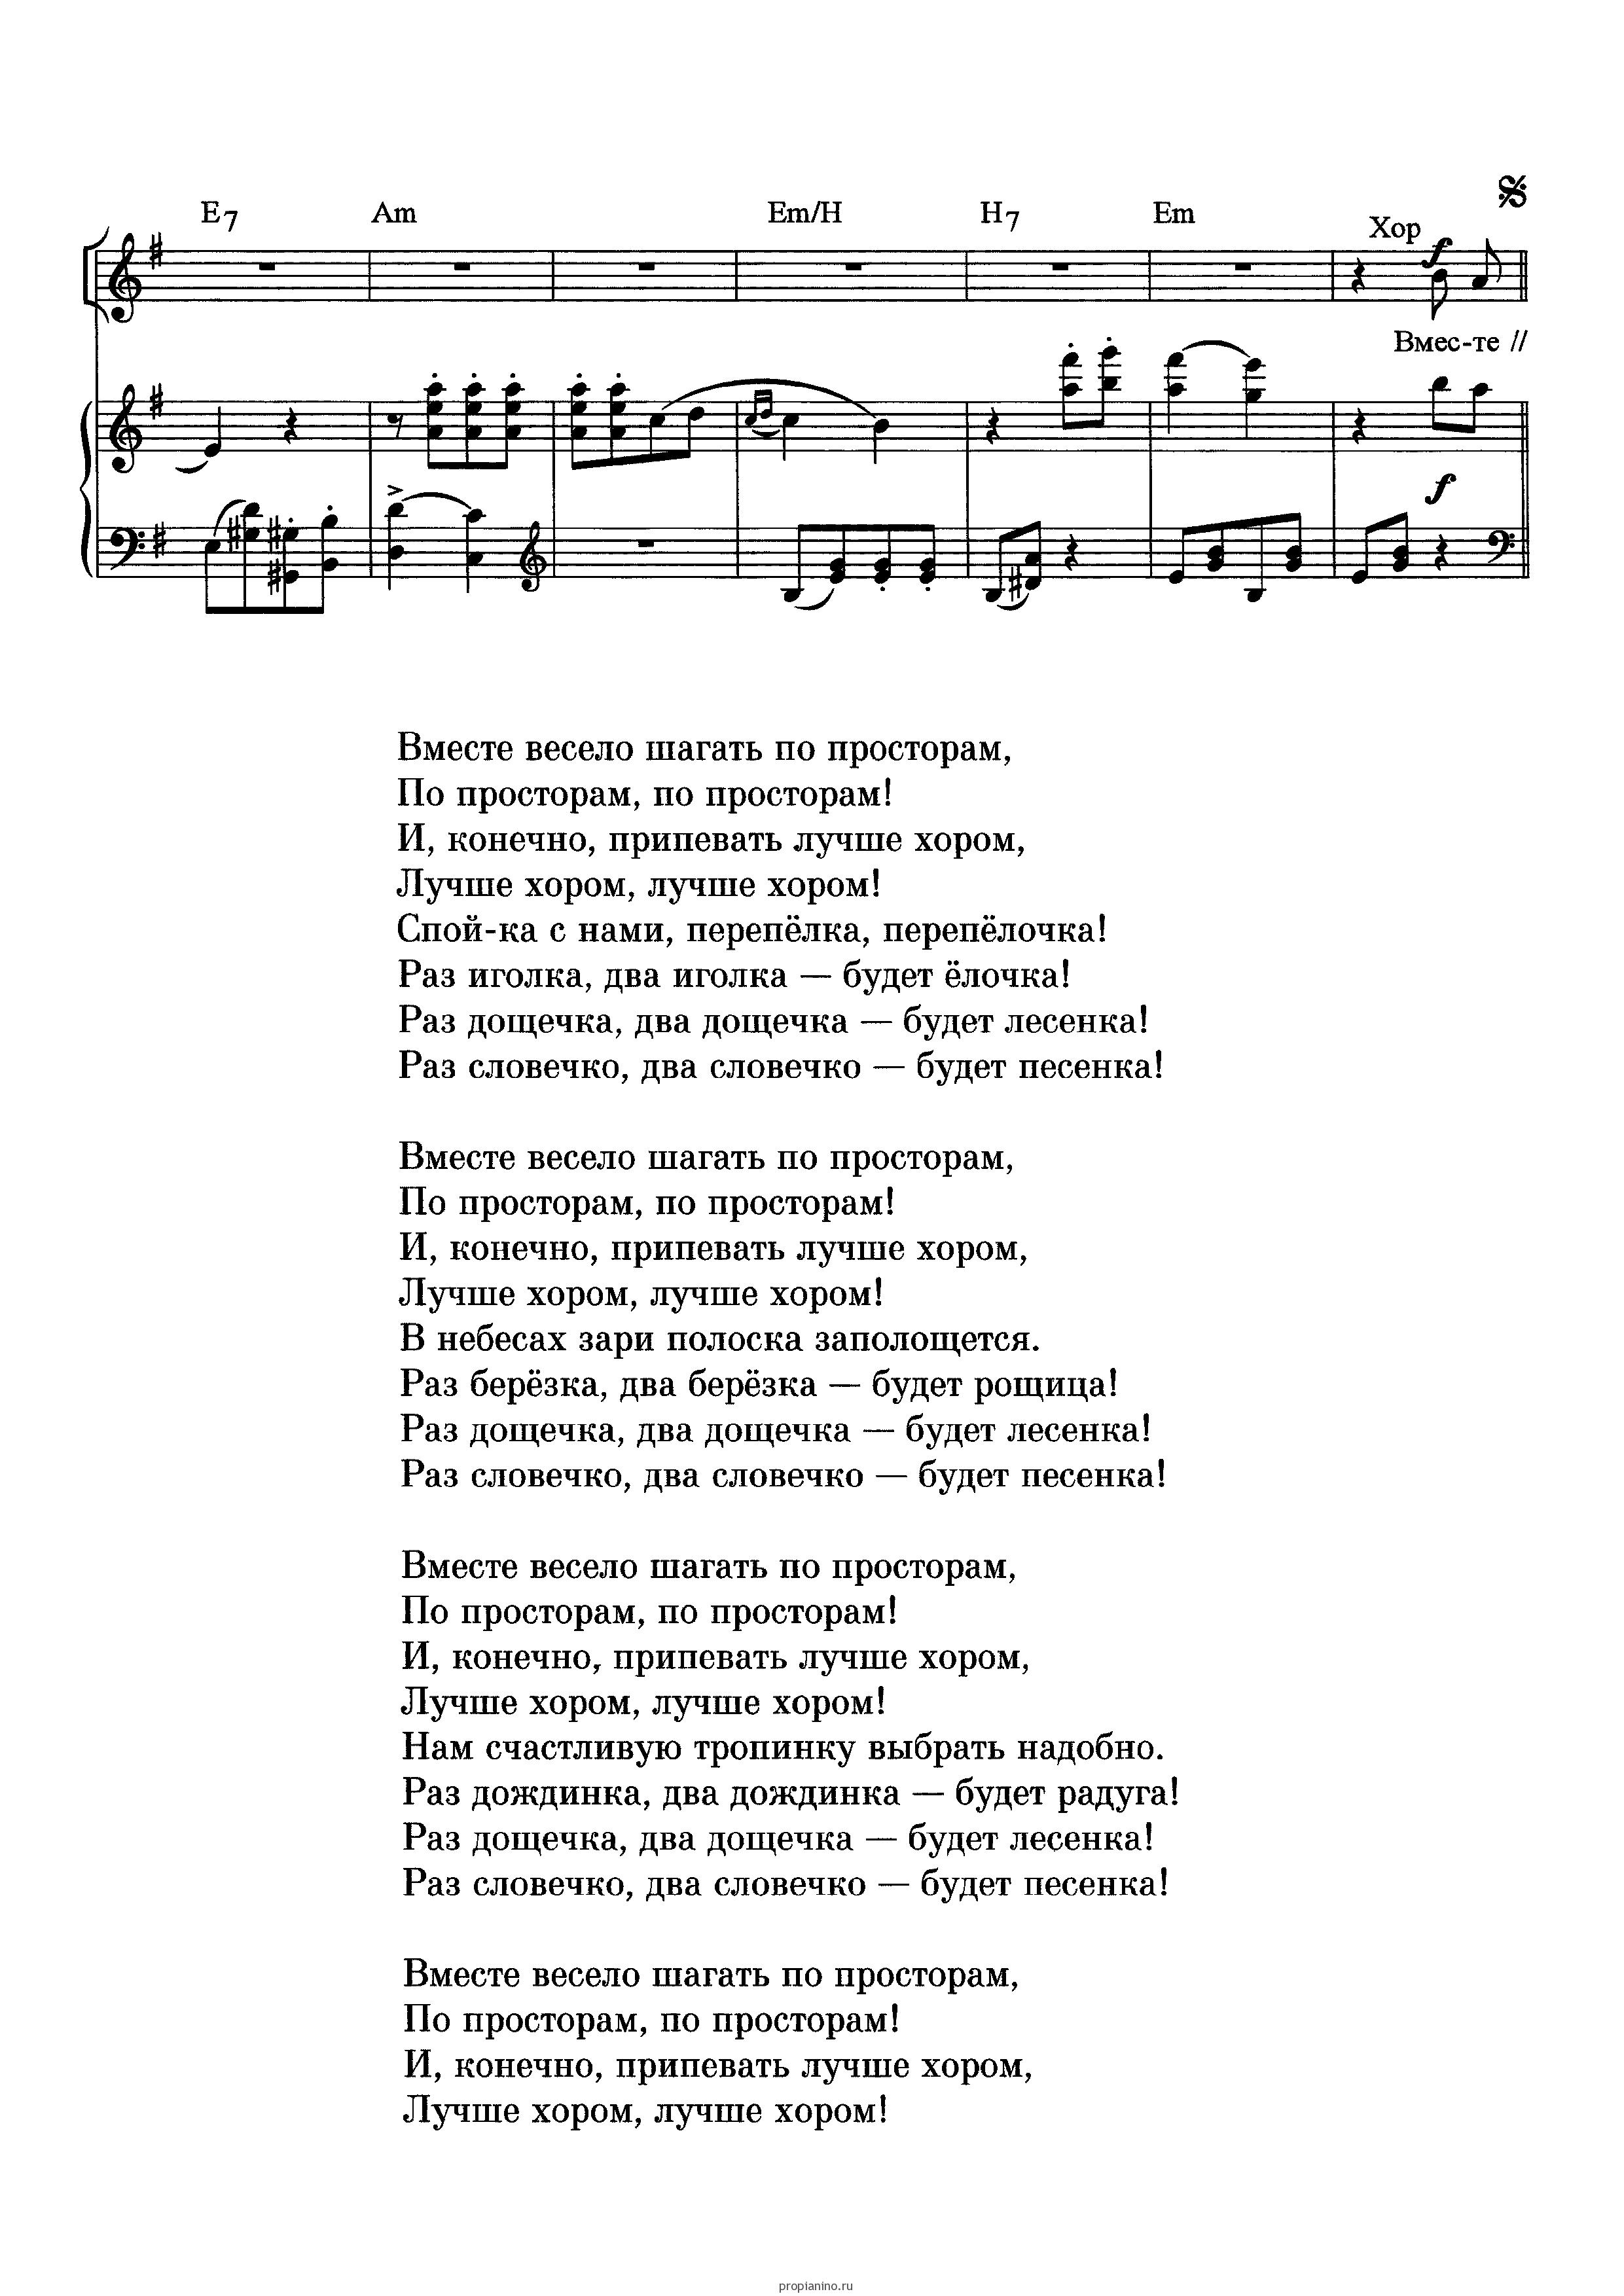 текст песни вместе весело